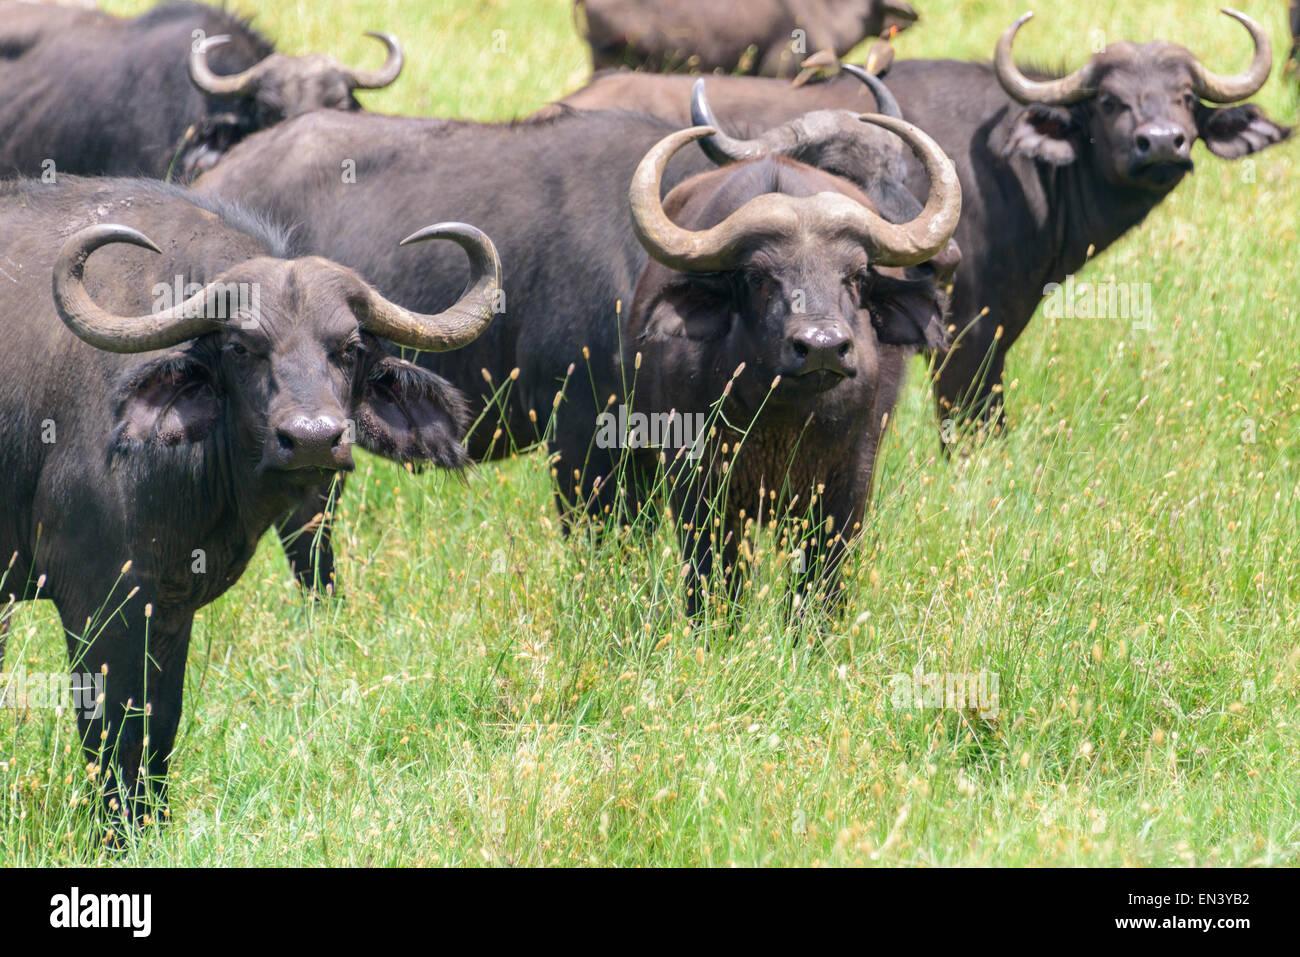 Syncerus caffer, African buffalo, Cape buffalo in Ngorongoro Conservation Area, Tanzania, Africa. Stock Photo